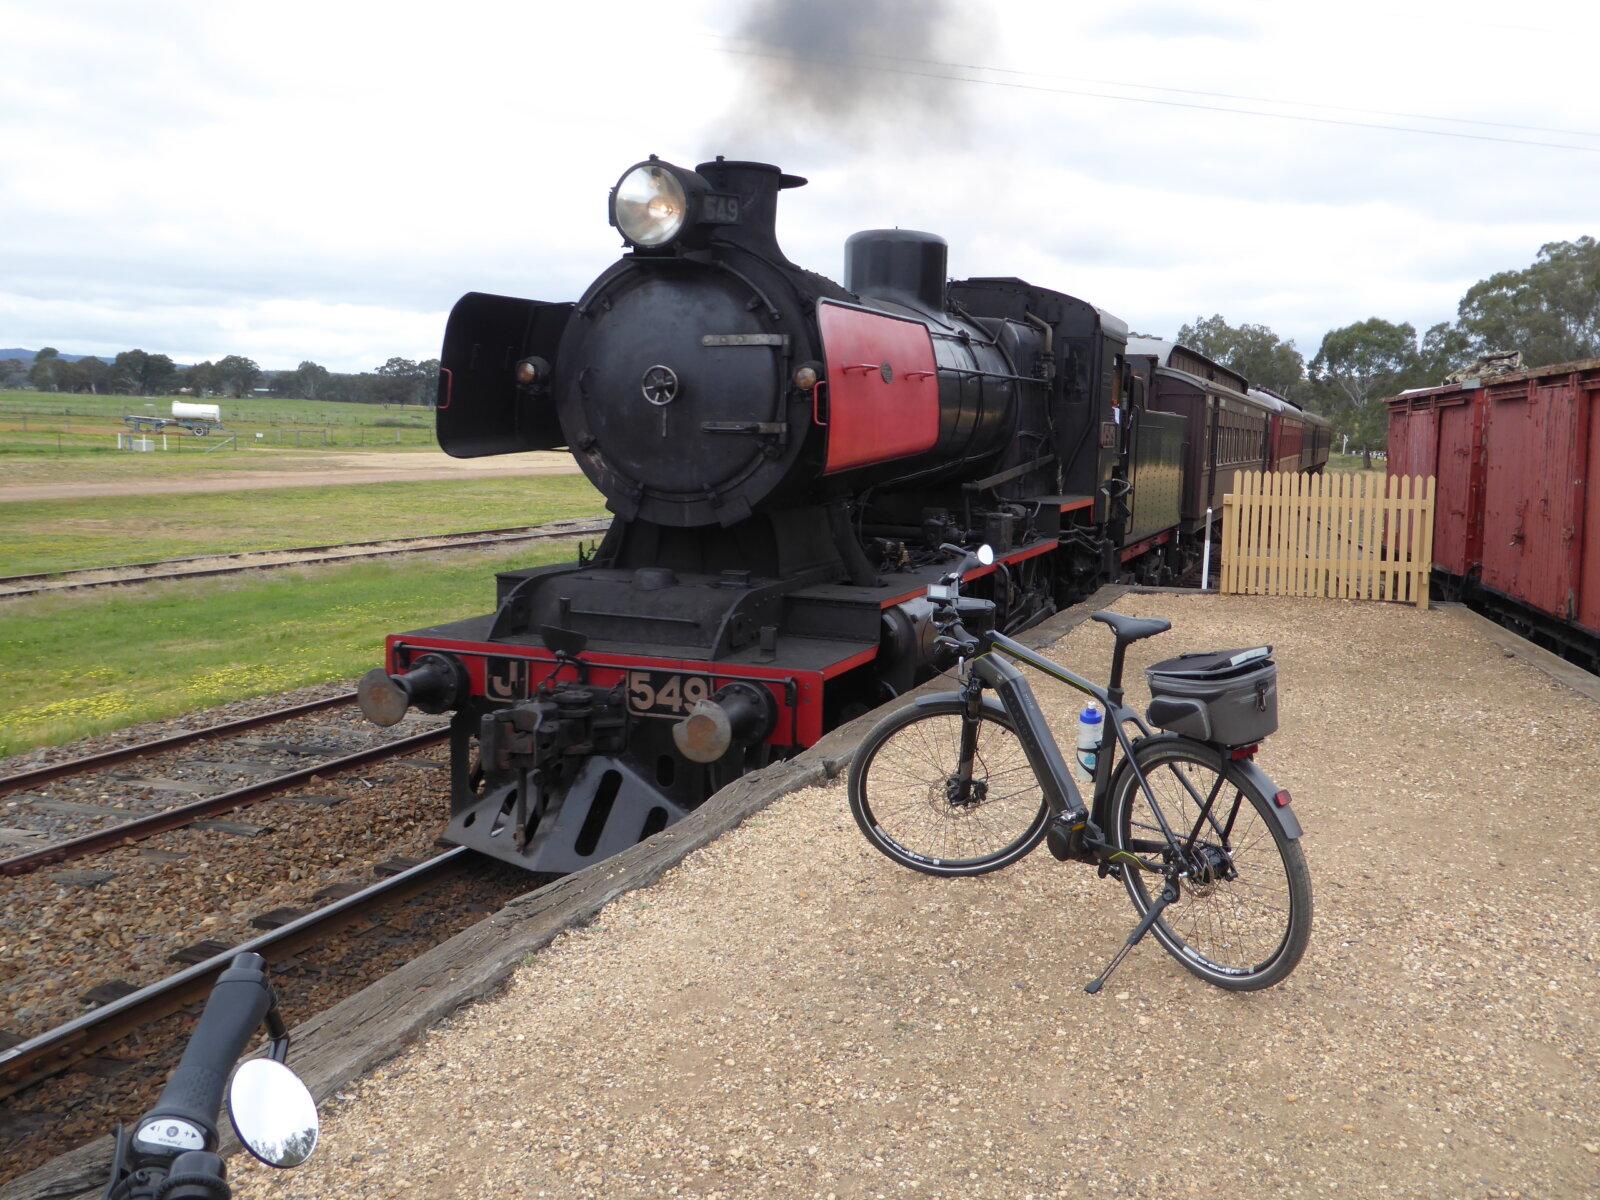 Train at Muckleford station